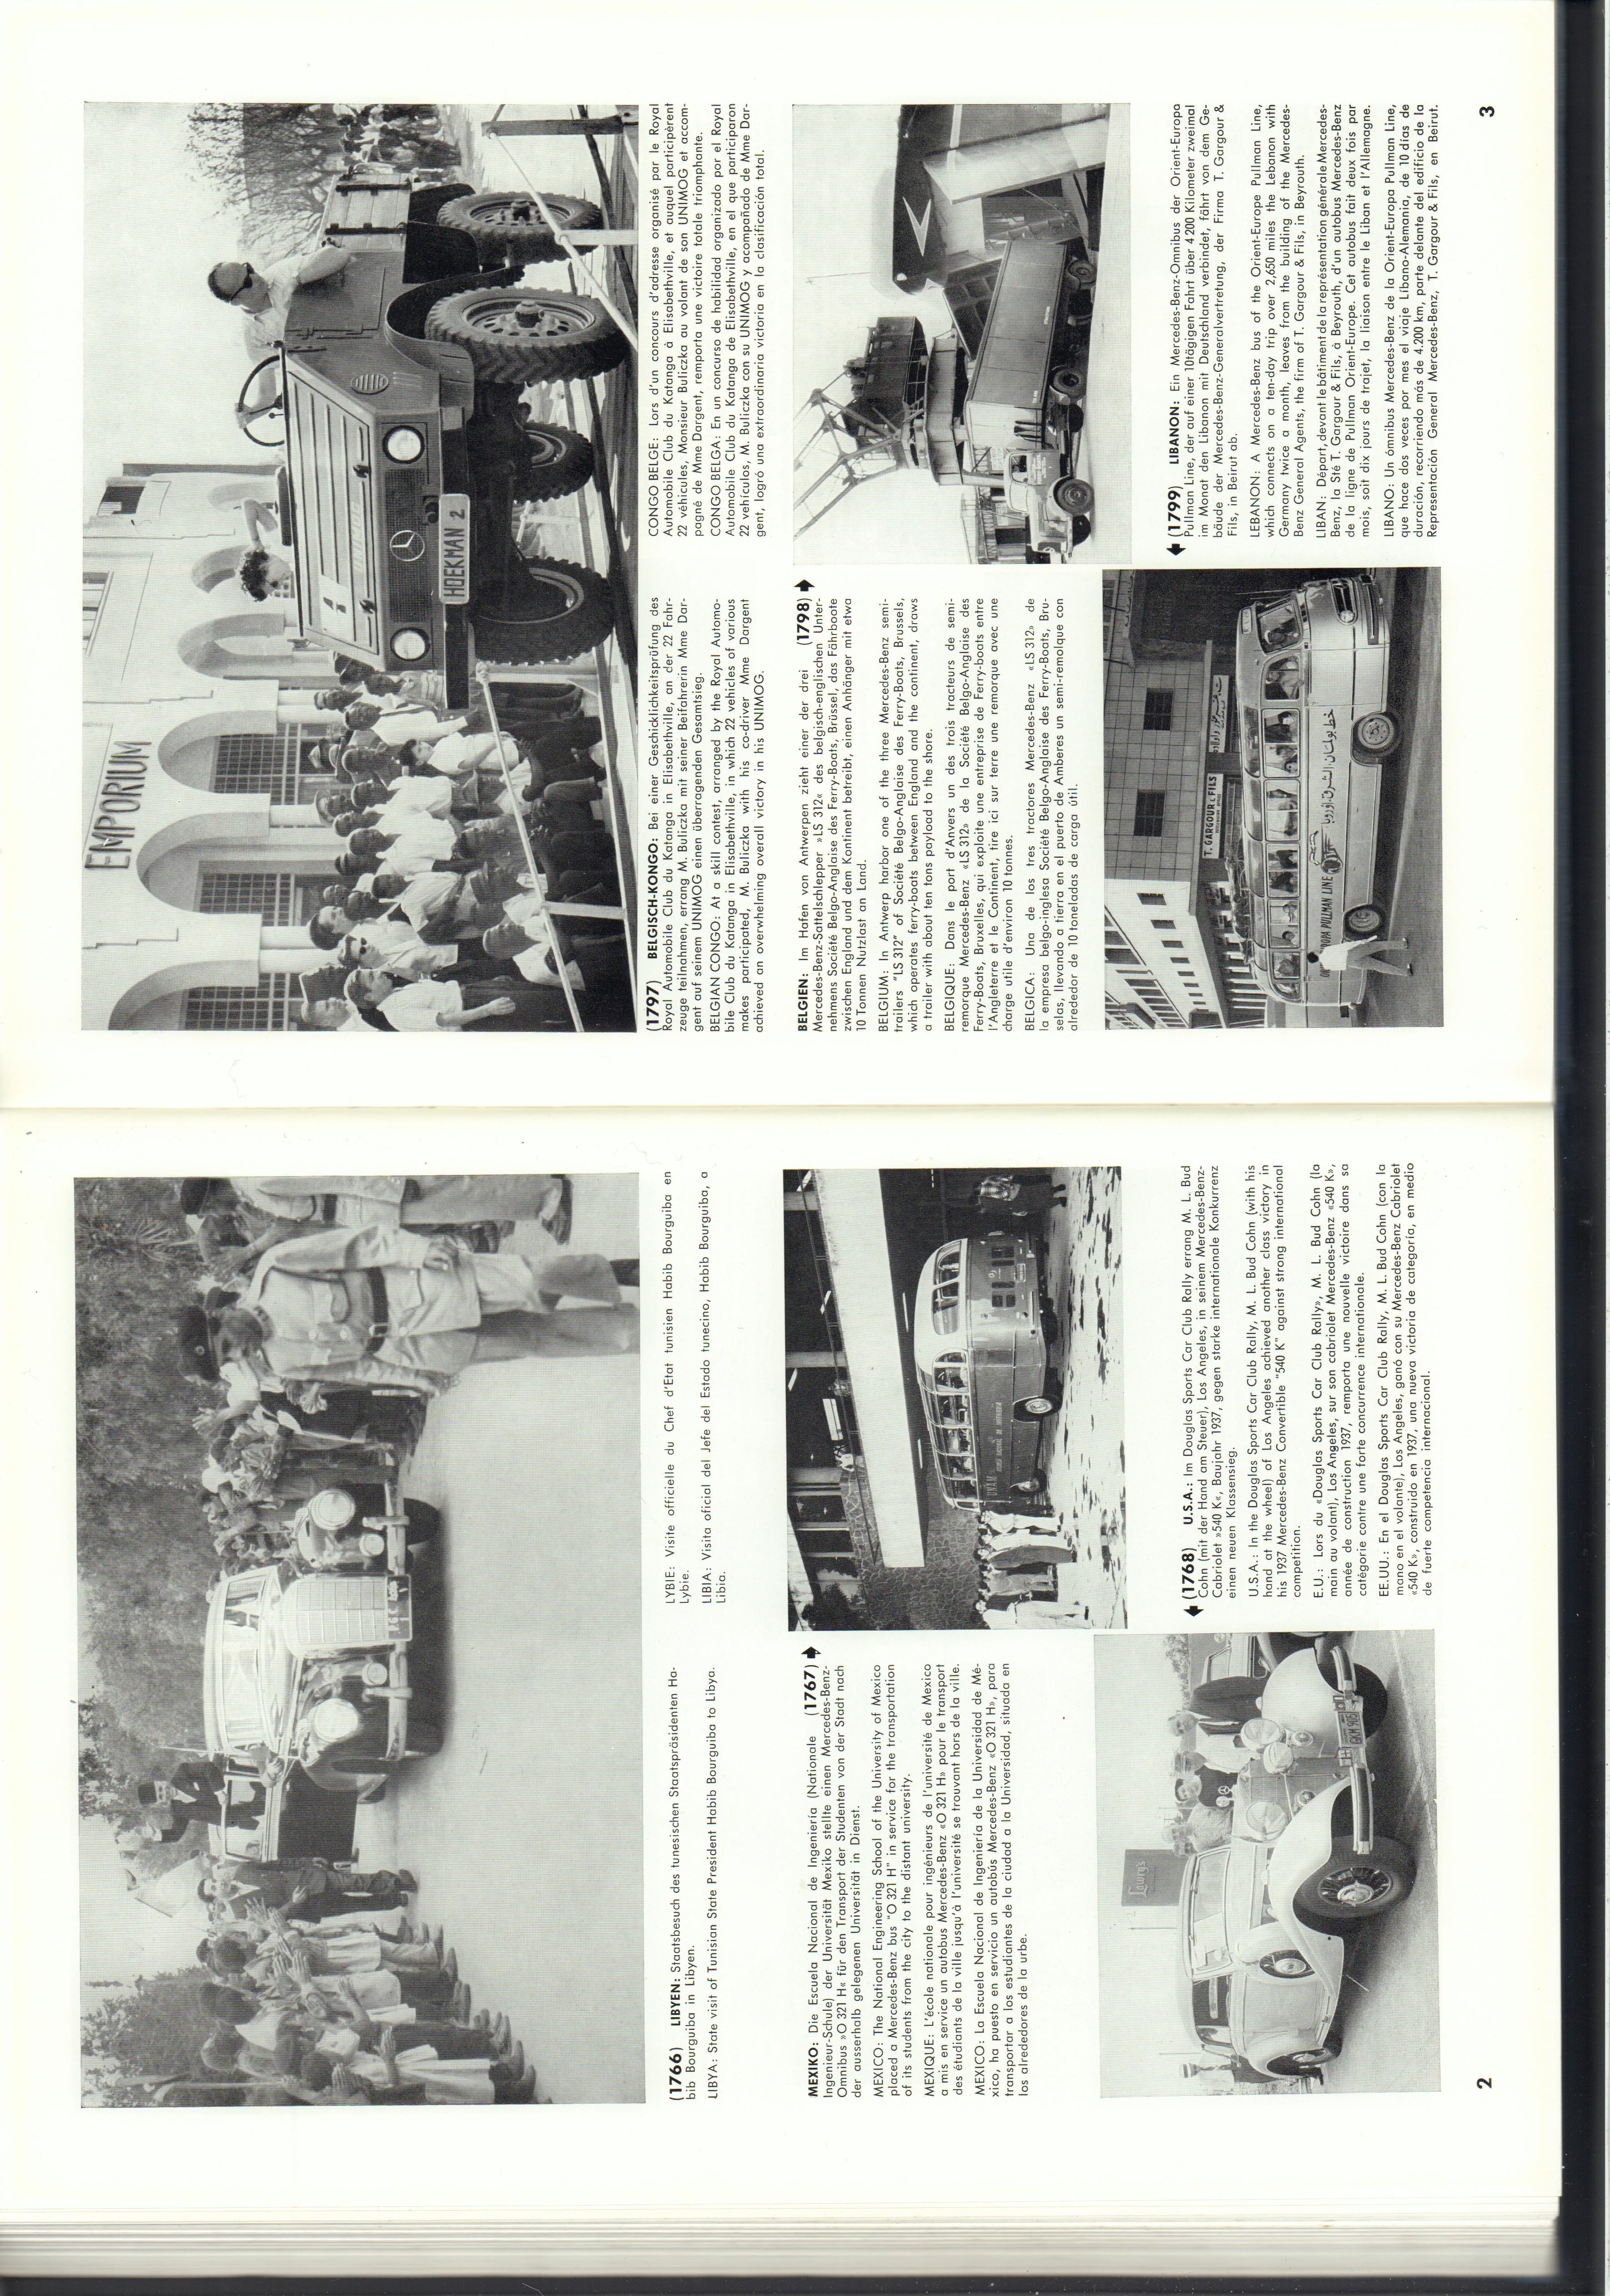 (REVISTA): Periódico In aller welt n.º 14 - Mercedes-Benz no mundo - 1957 - multilingue 002